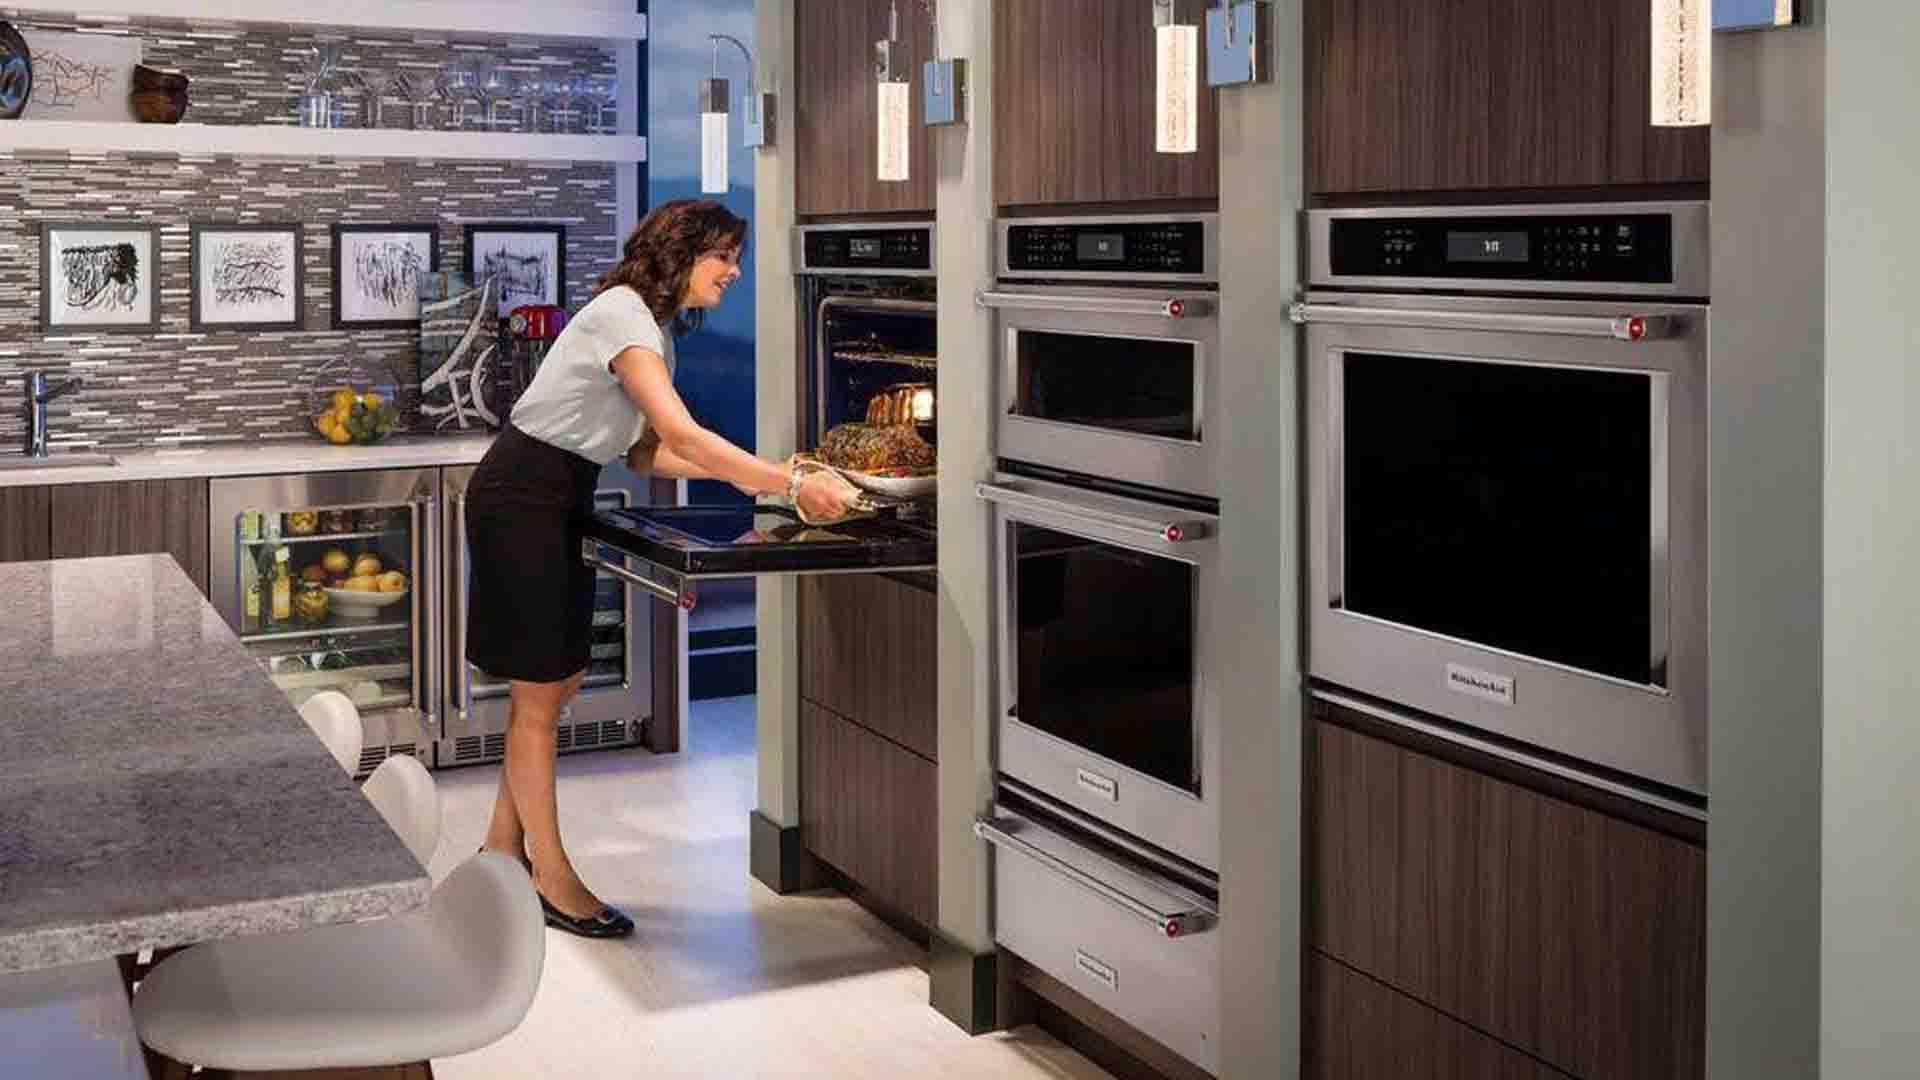 KitchenAid Combination Wall Oven Repair Service   Kitchenaid Repairs